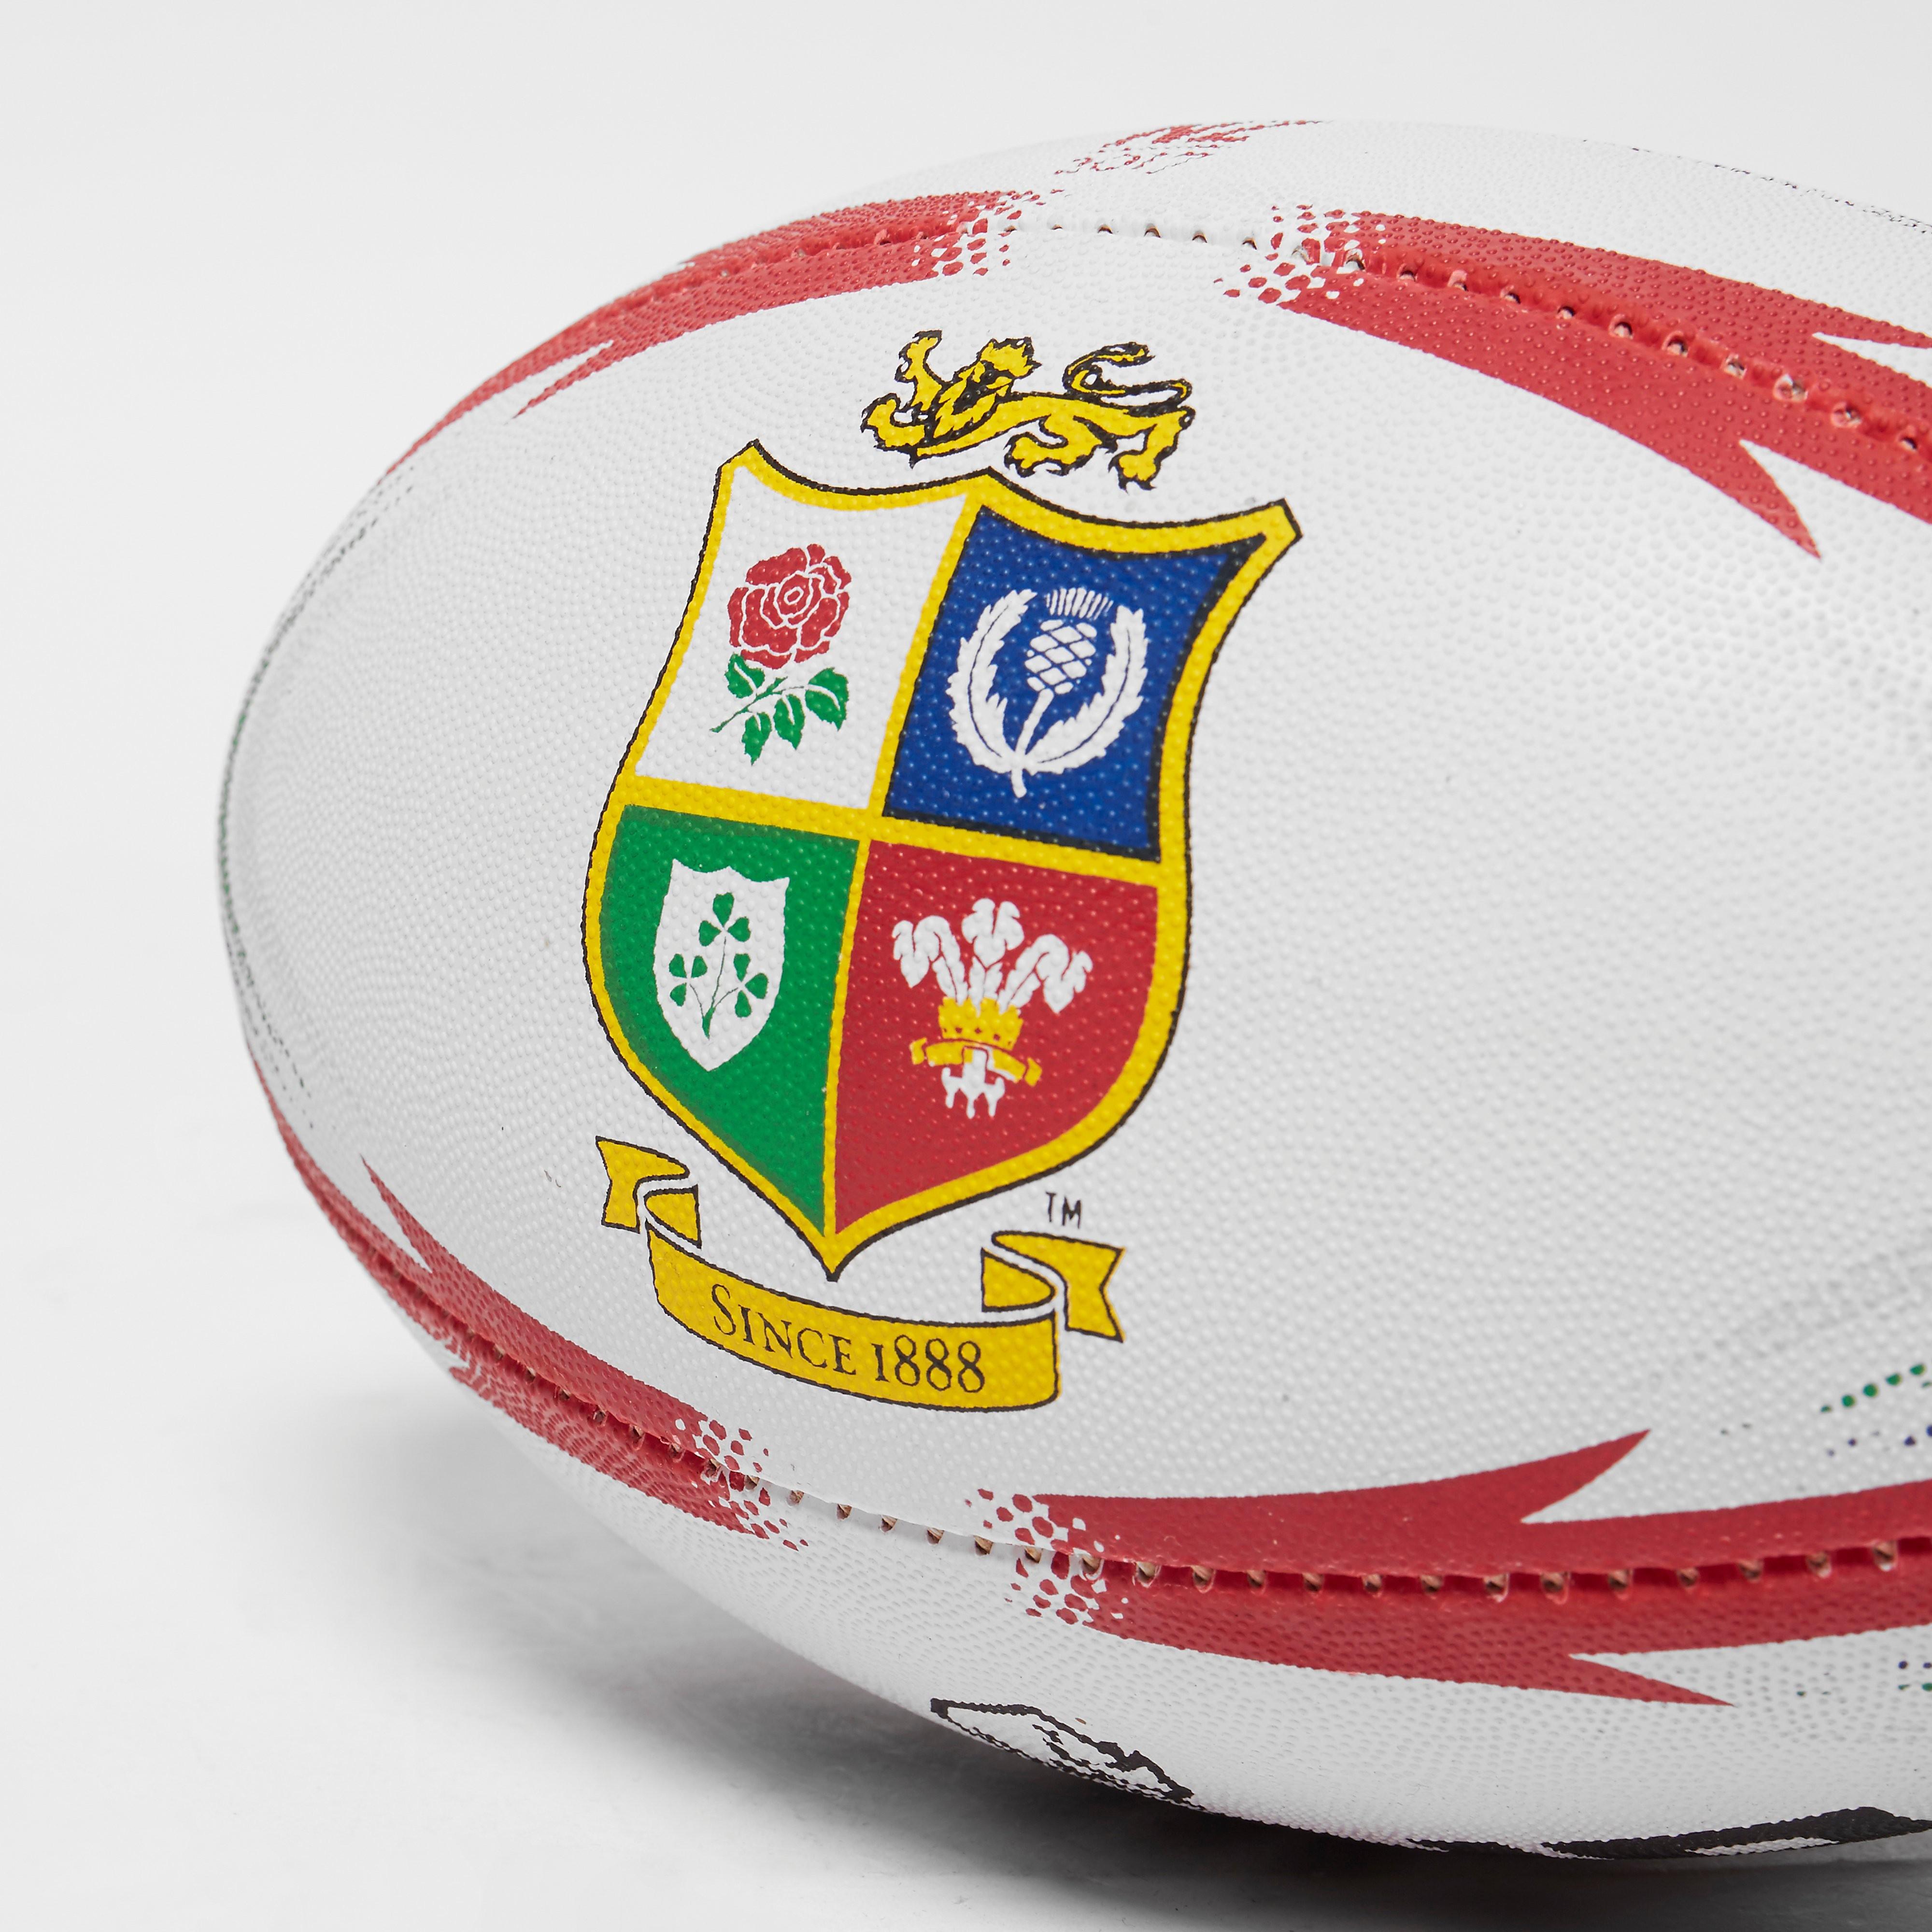 Rhino teamwear Lions Midi Replica Rugby Ball